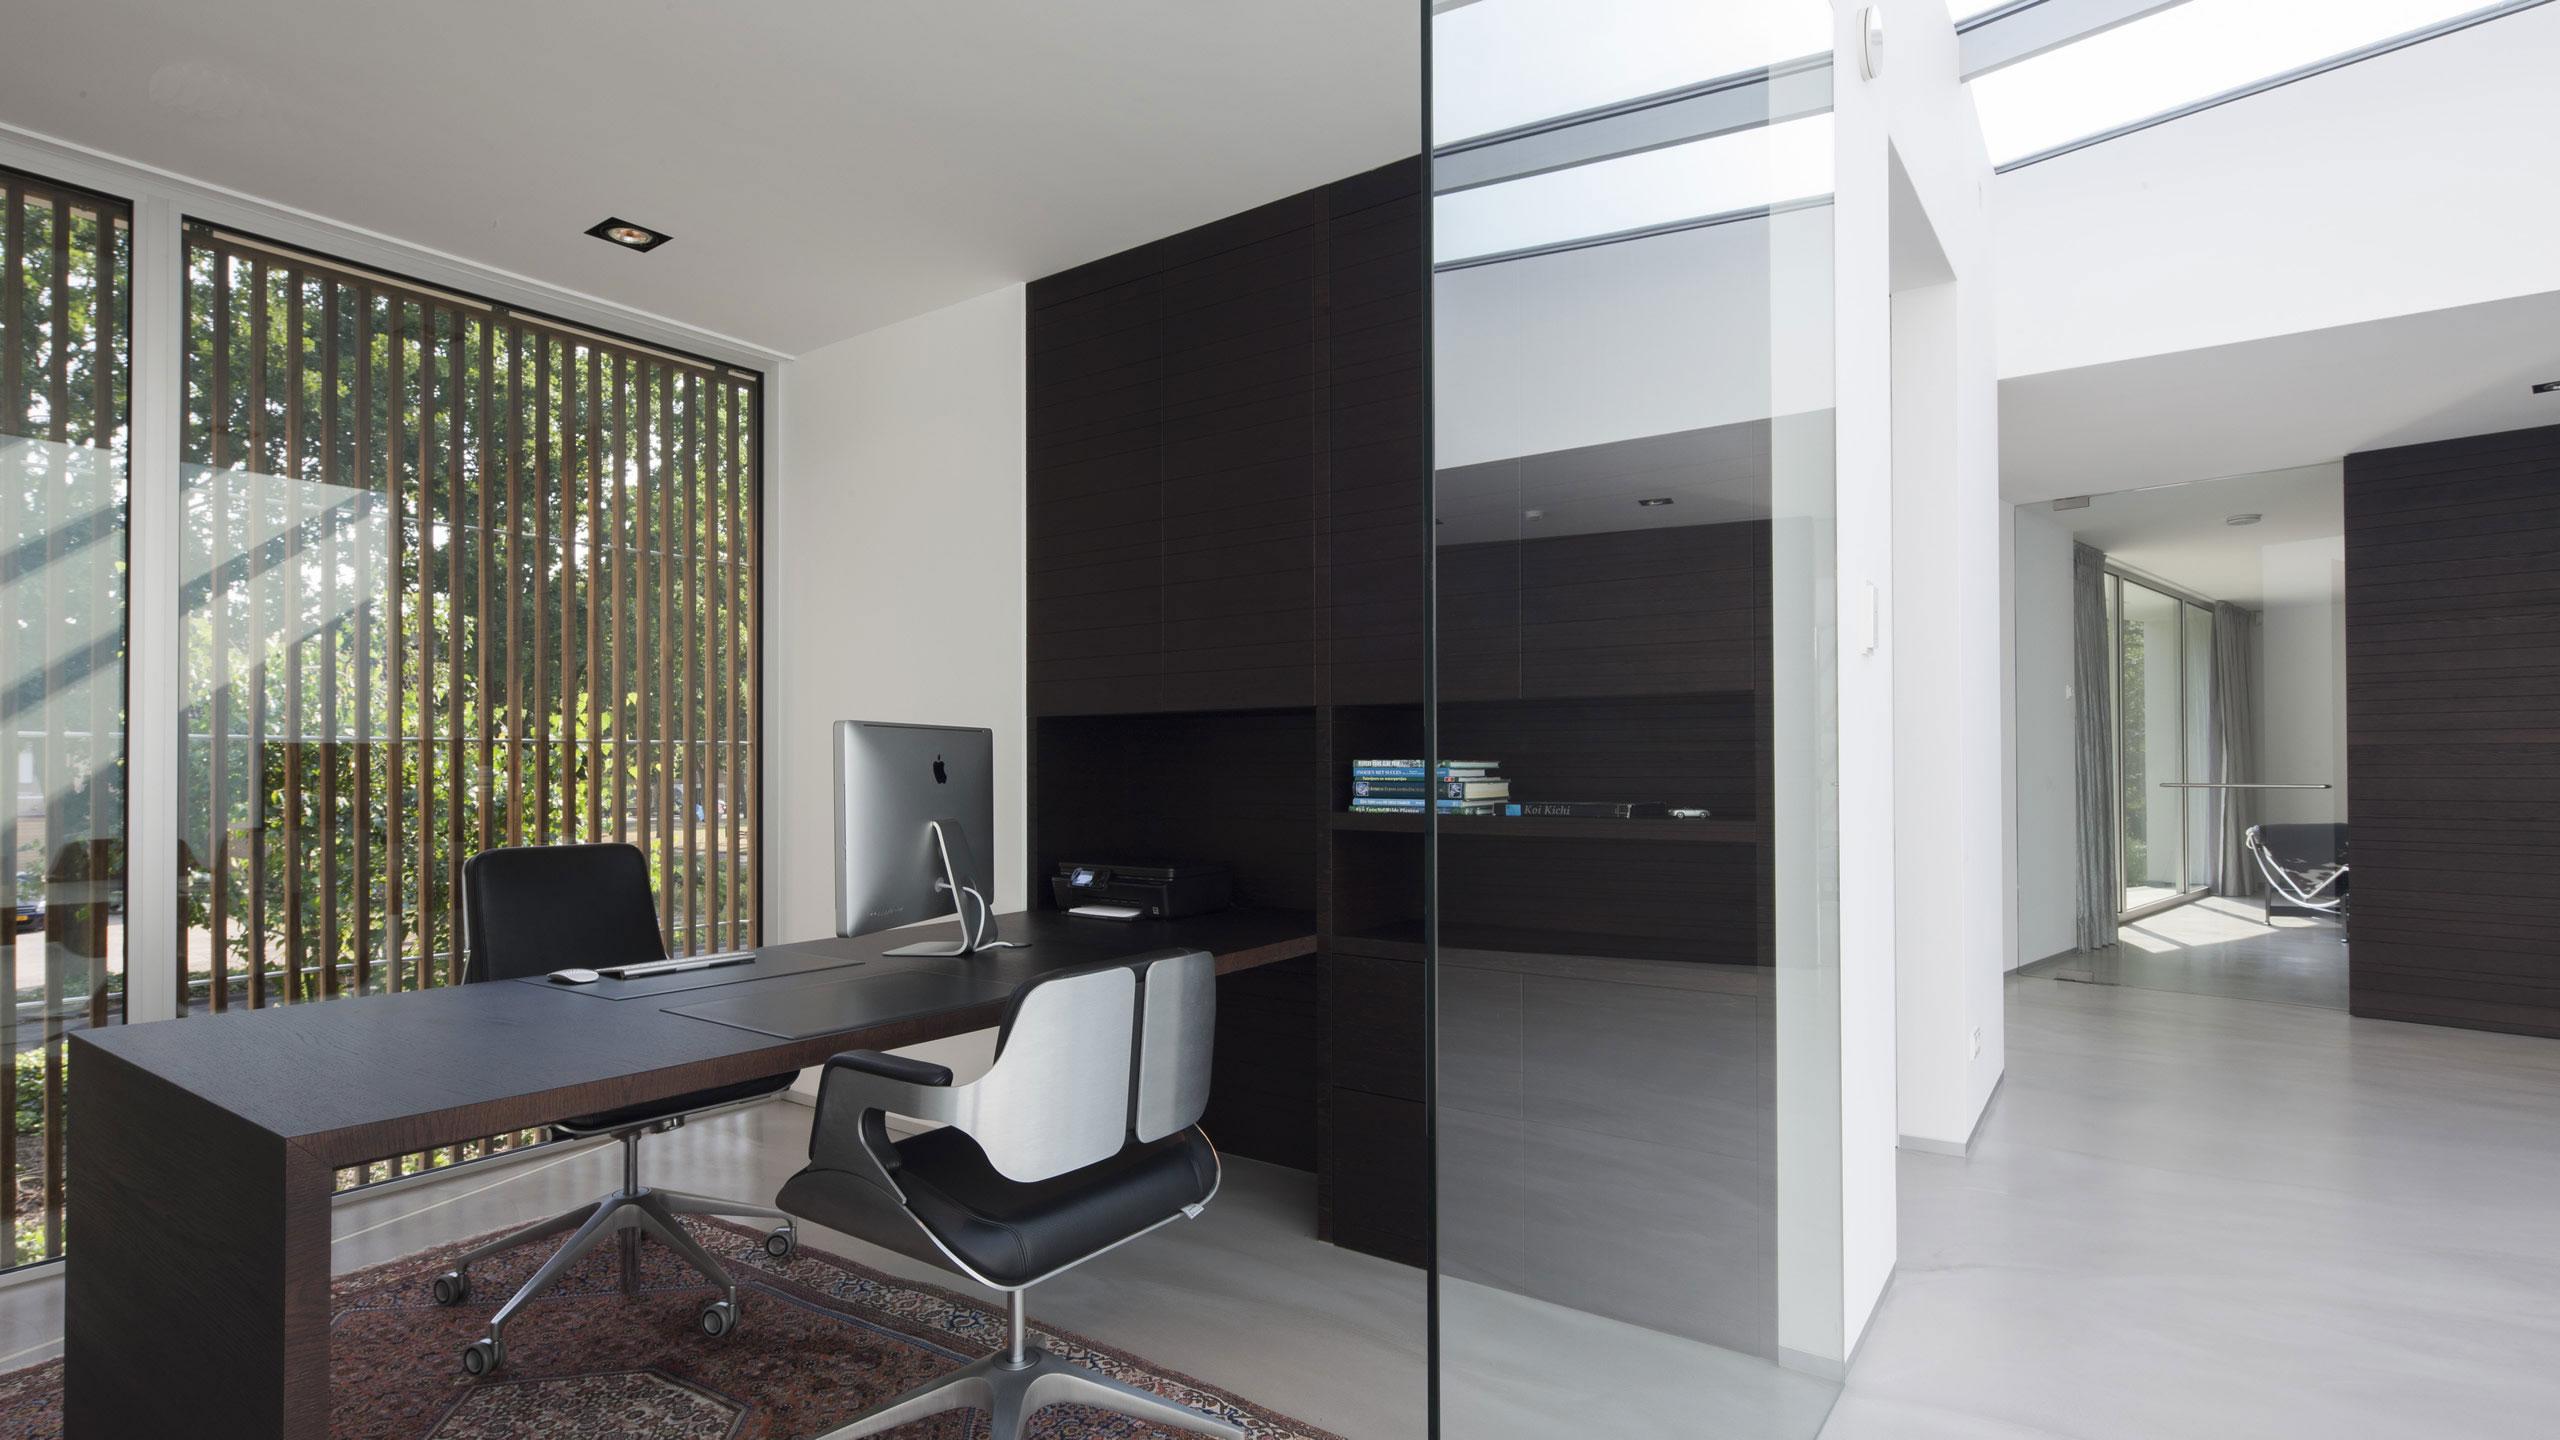 Boxed Villa Spee Haelen with Panoramic Windows by Lab32 architecten-30